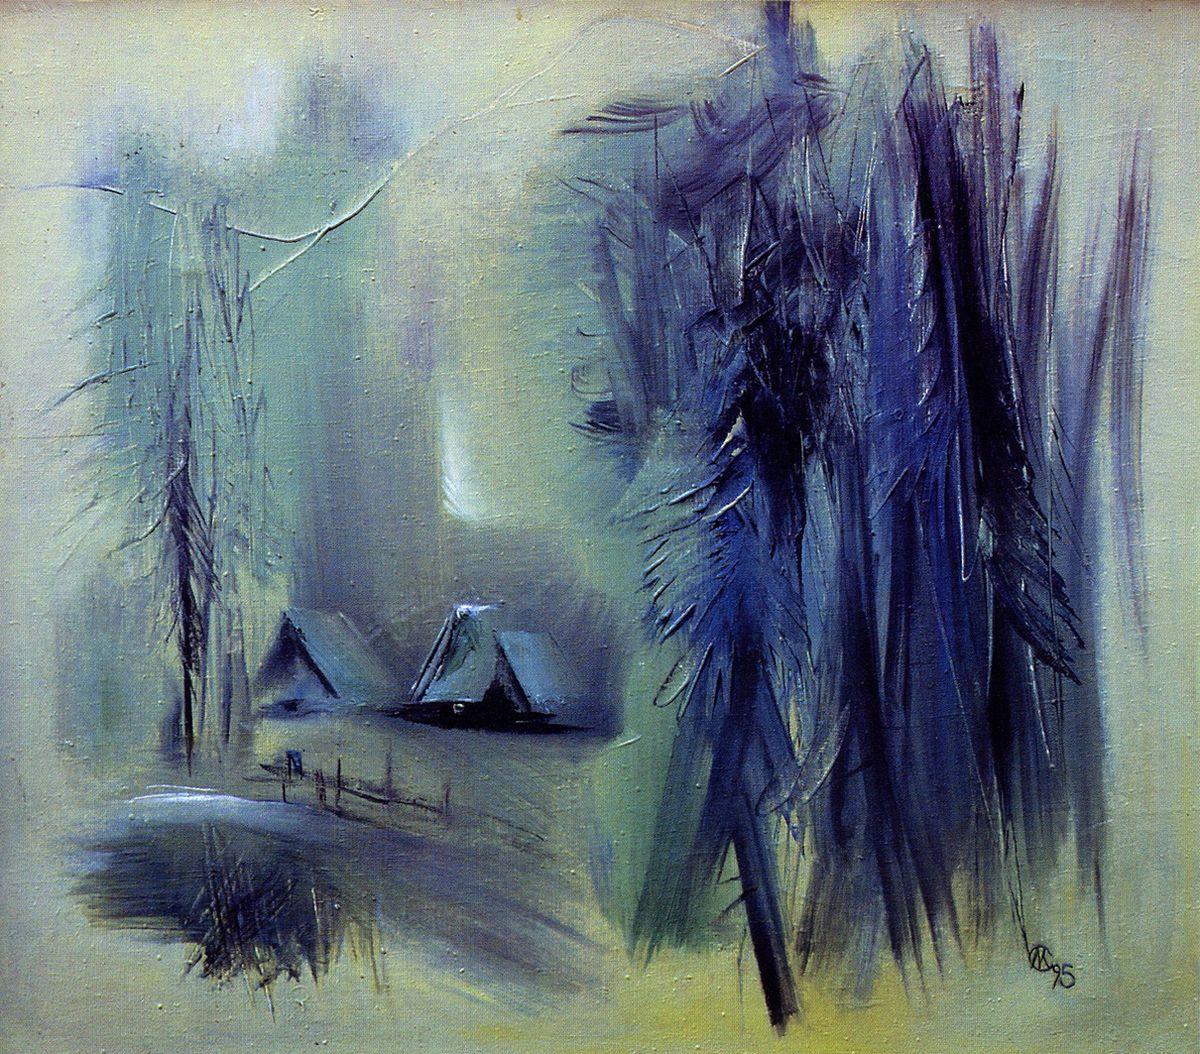 Євген Манишин. Карпатський пейзаж, 1995